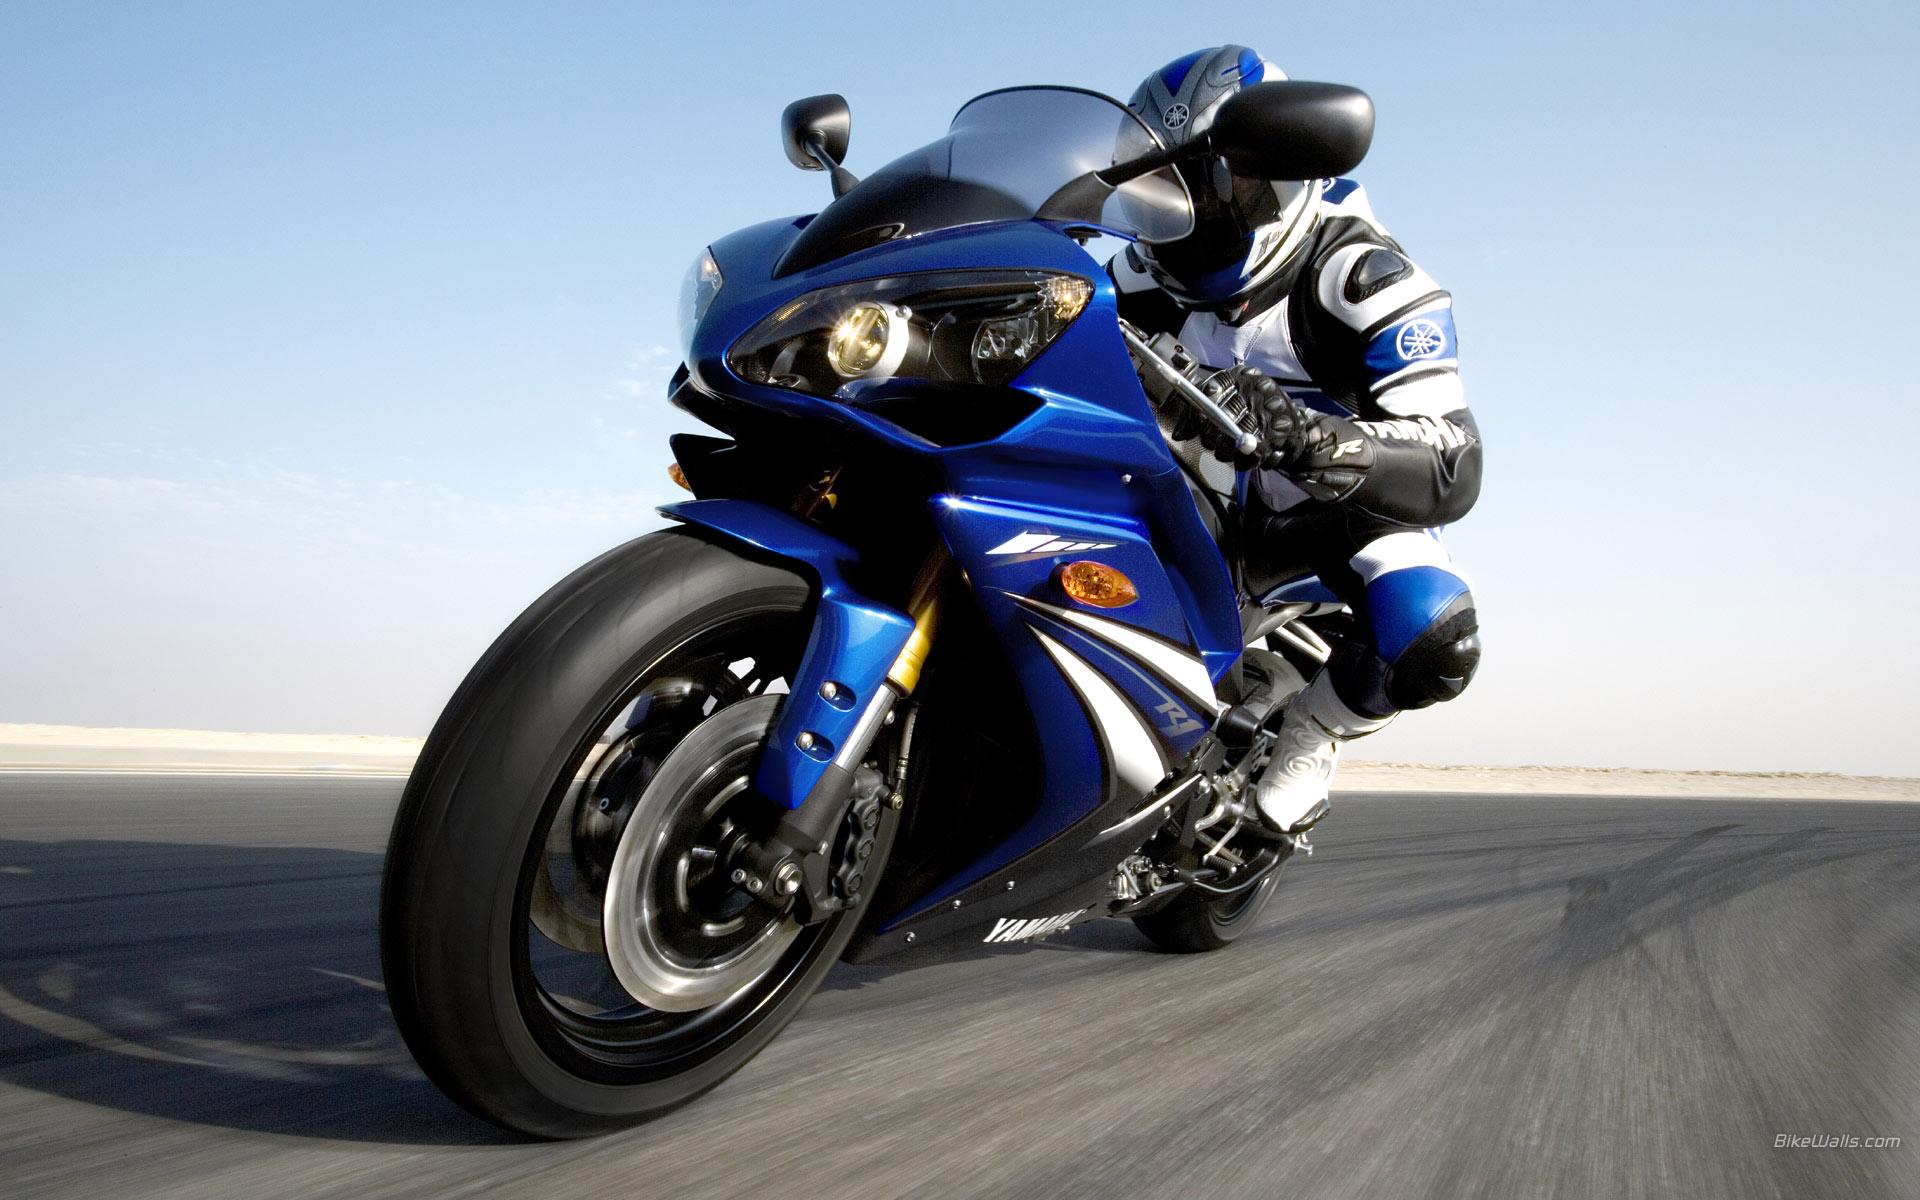 Moto Yamaha azul - 1920x1200